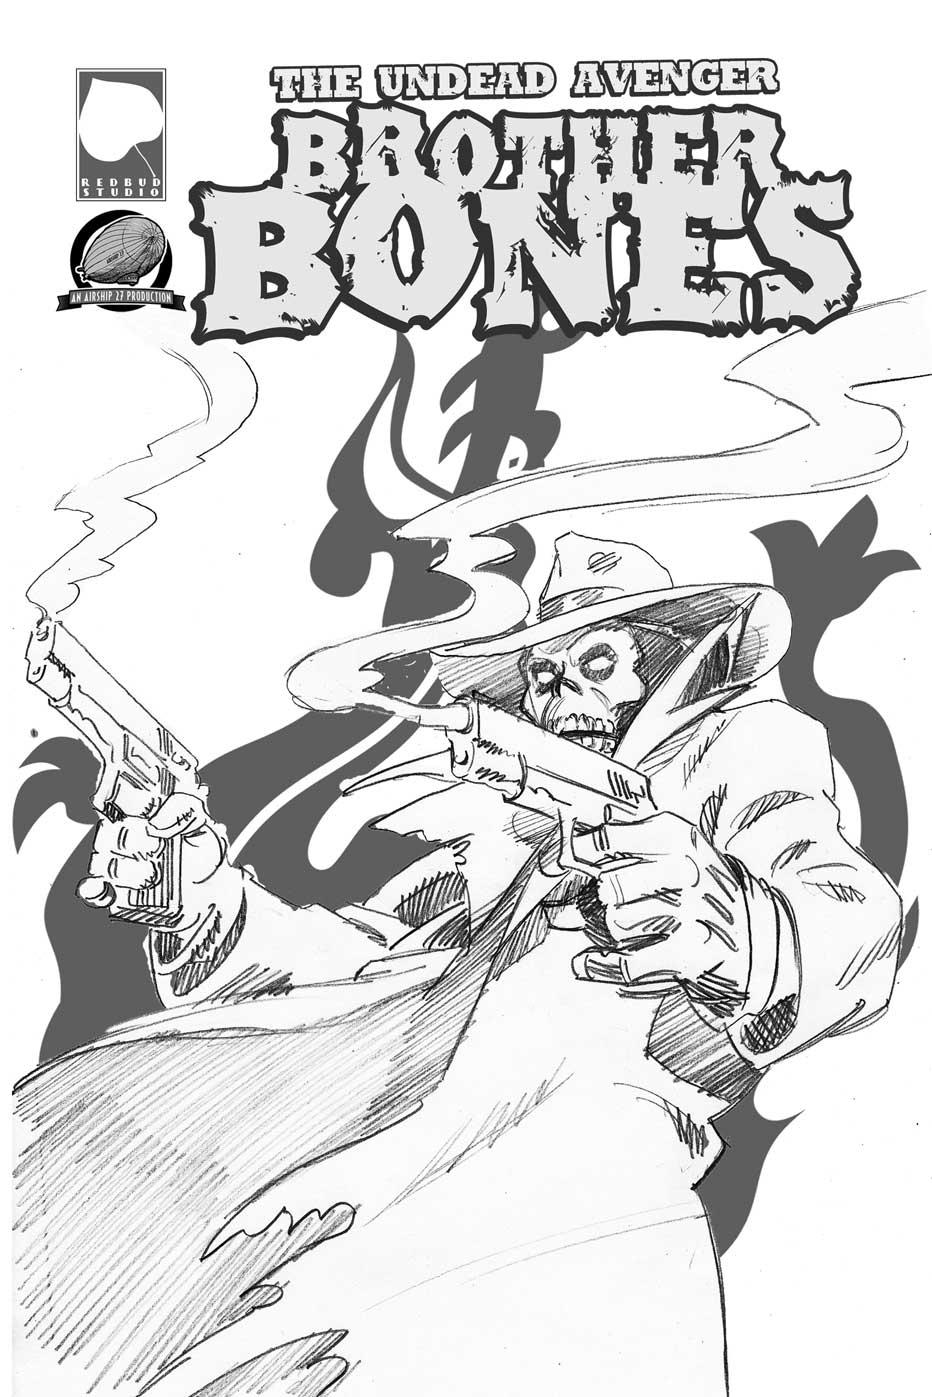 BONES COMIC